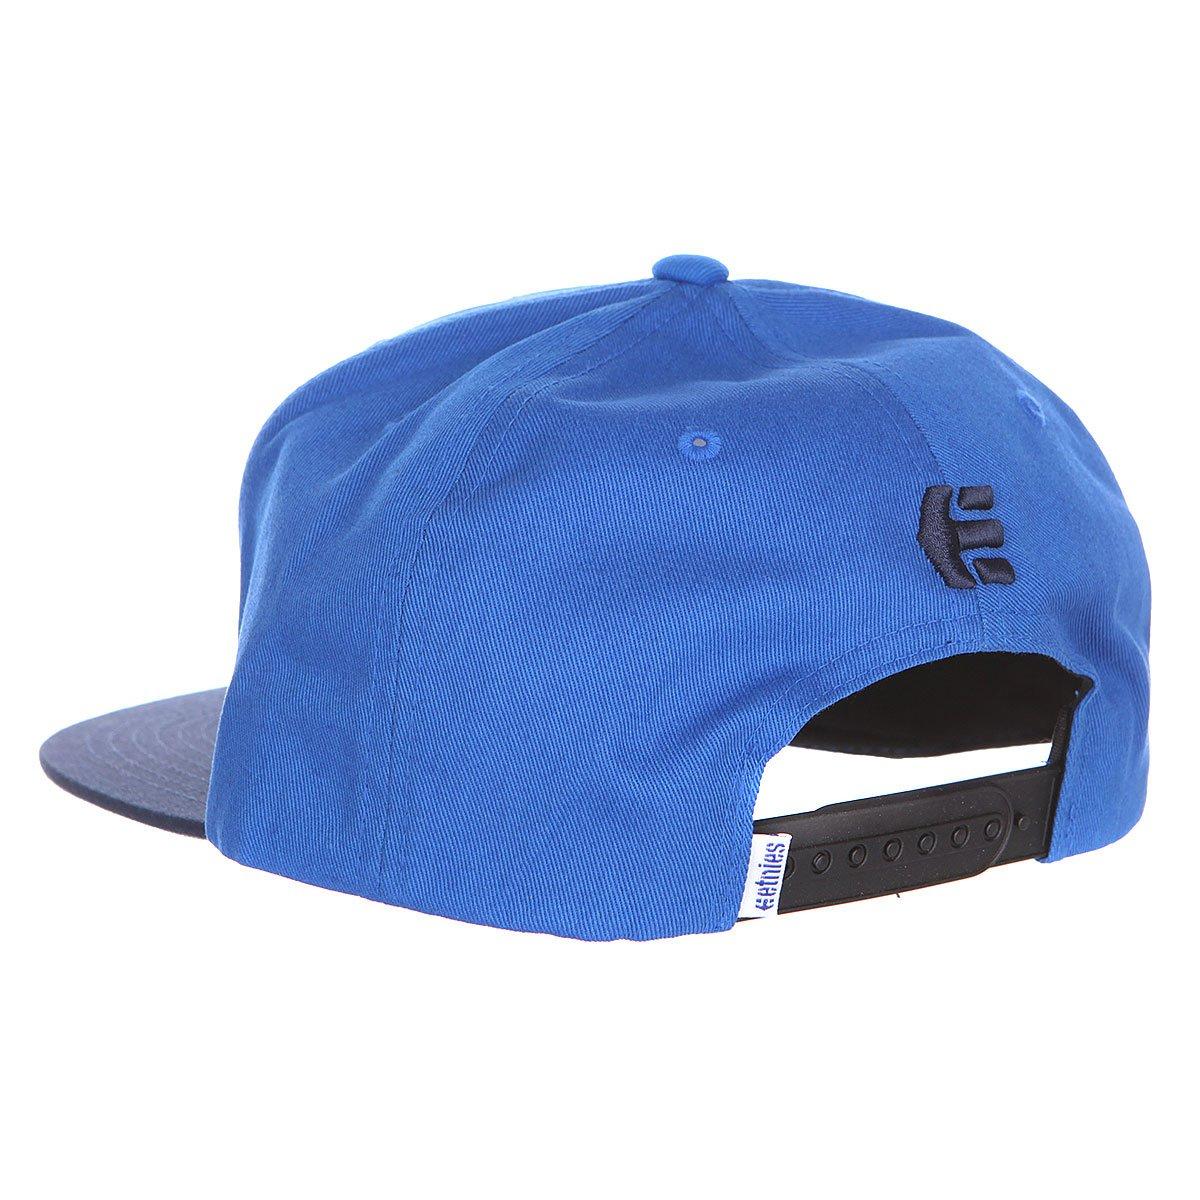 Бейсболка Etnies Corporate 4 Snapback Hat Navy/Blue